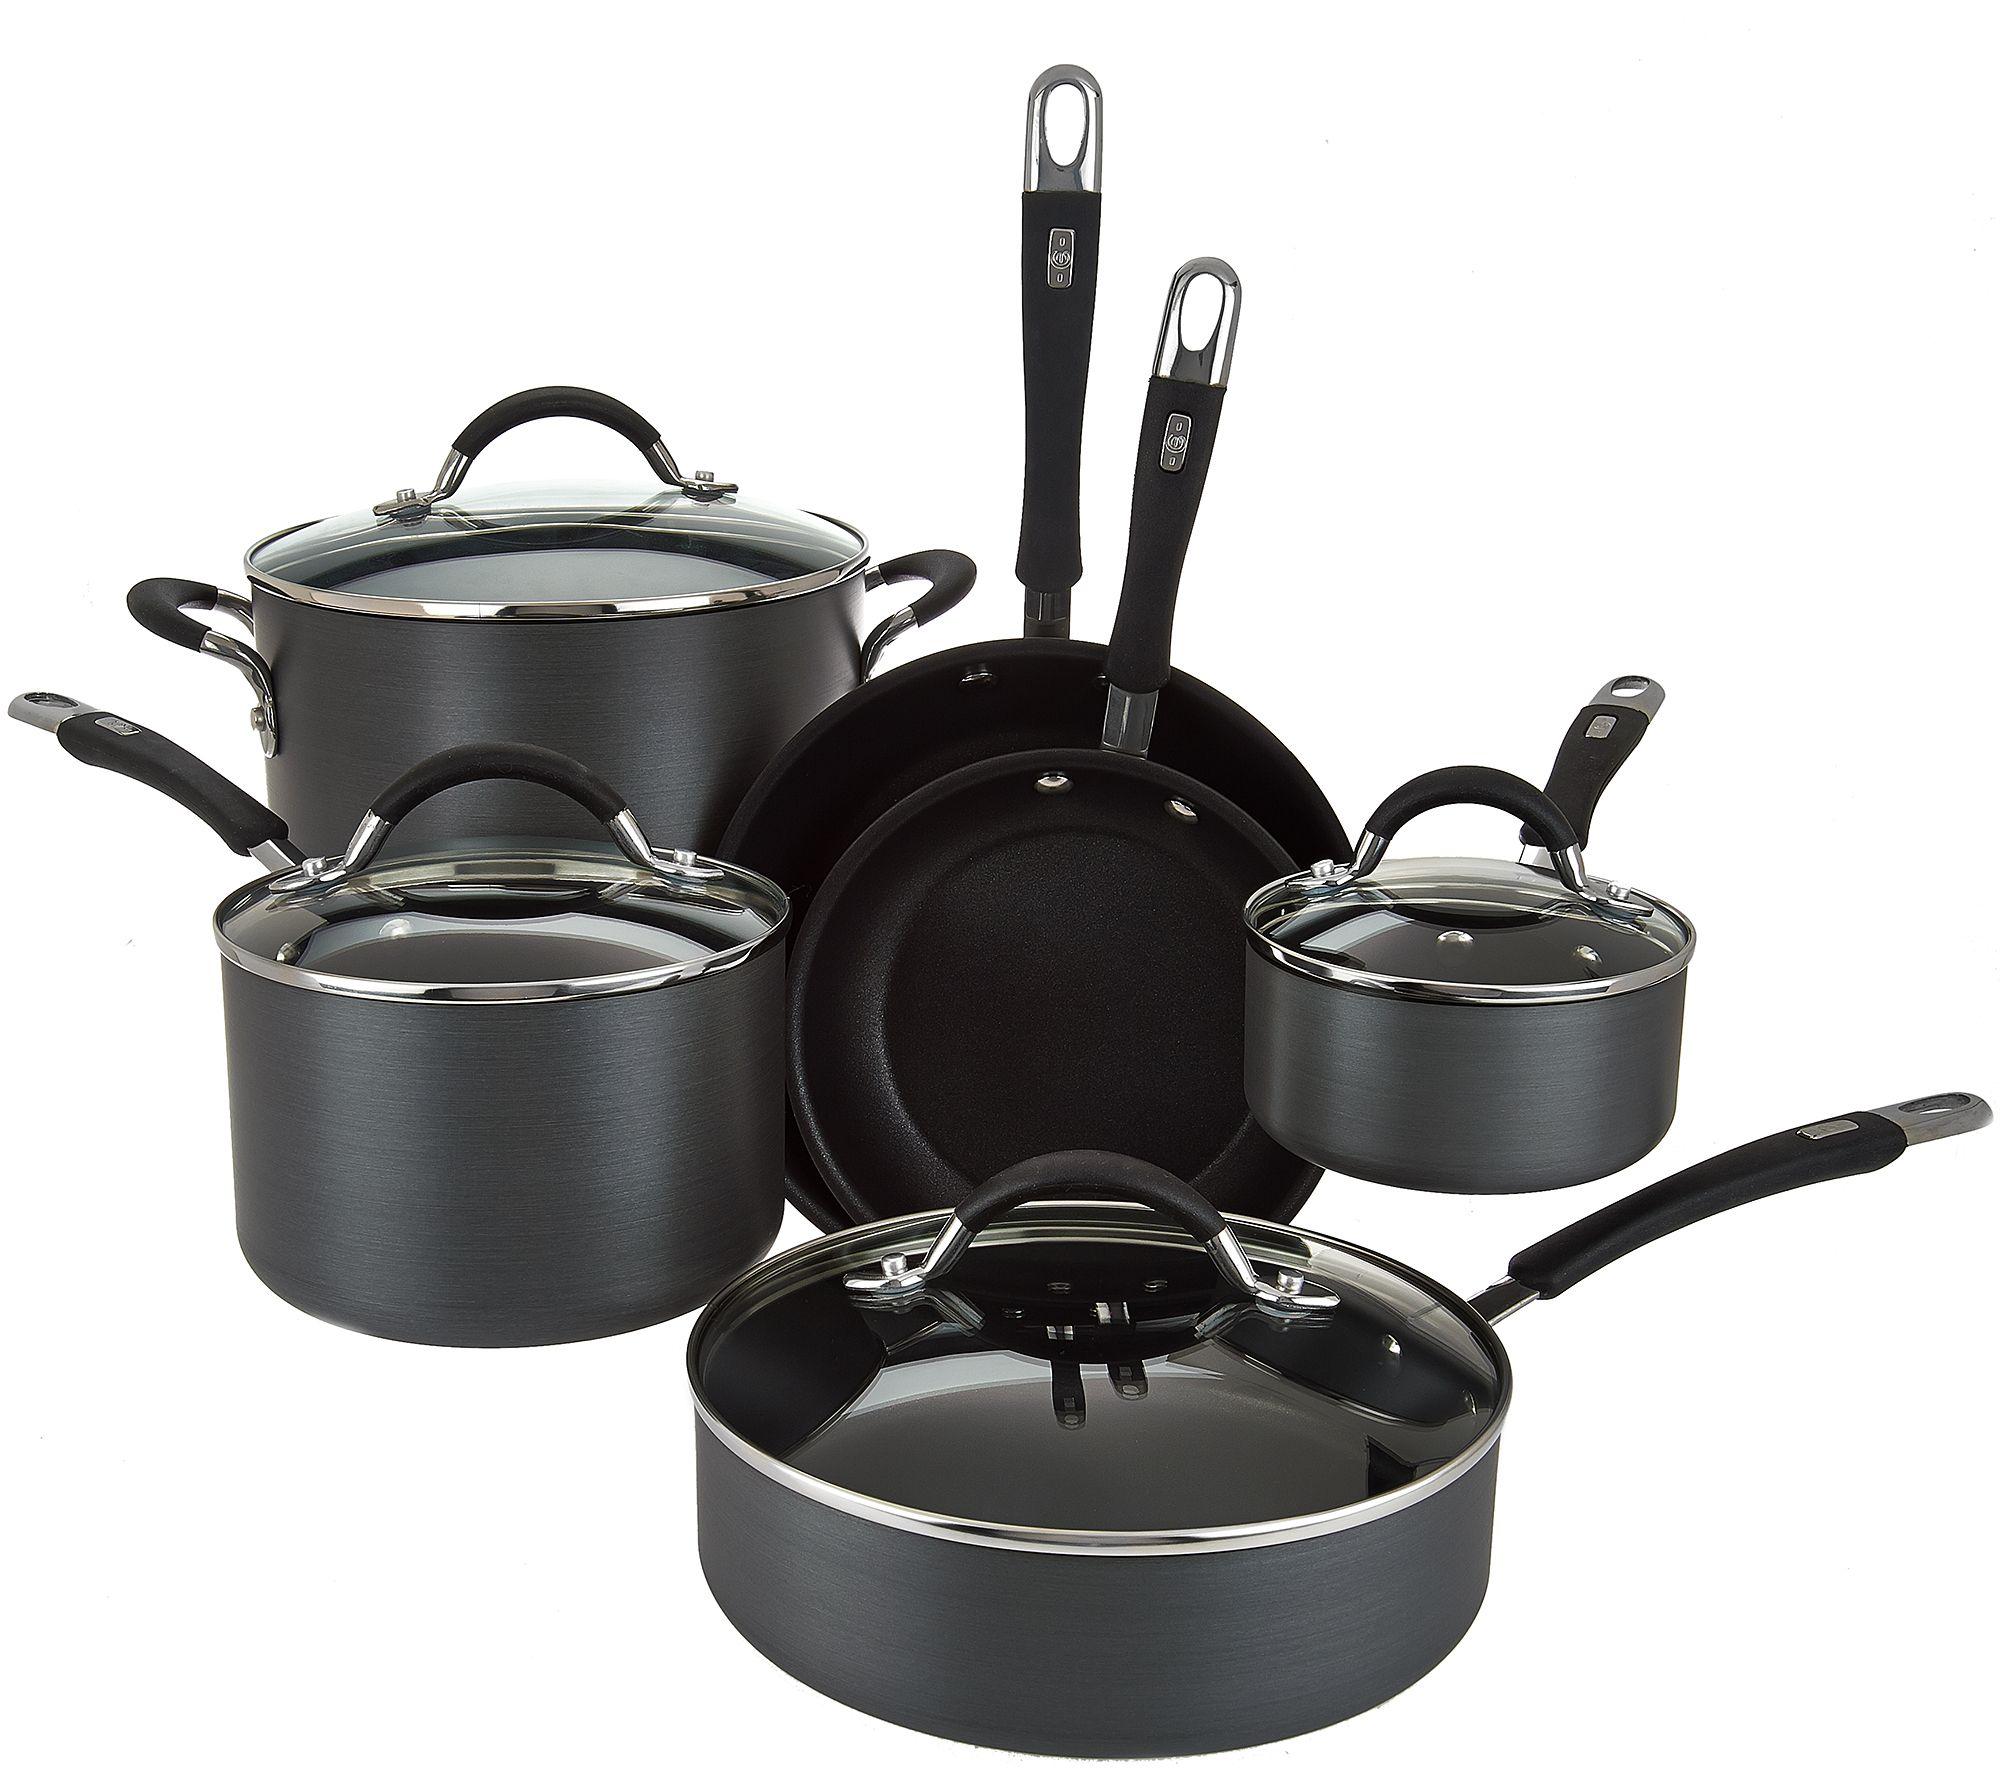 Kitchen Set Graver: Cook's Essentials 10-piece Hard Anodized Cookware Set